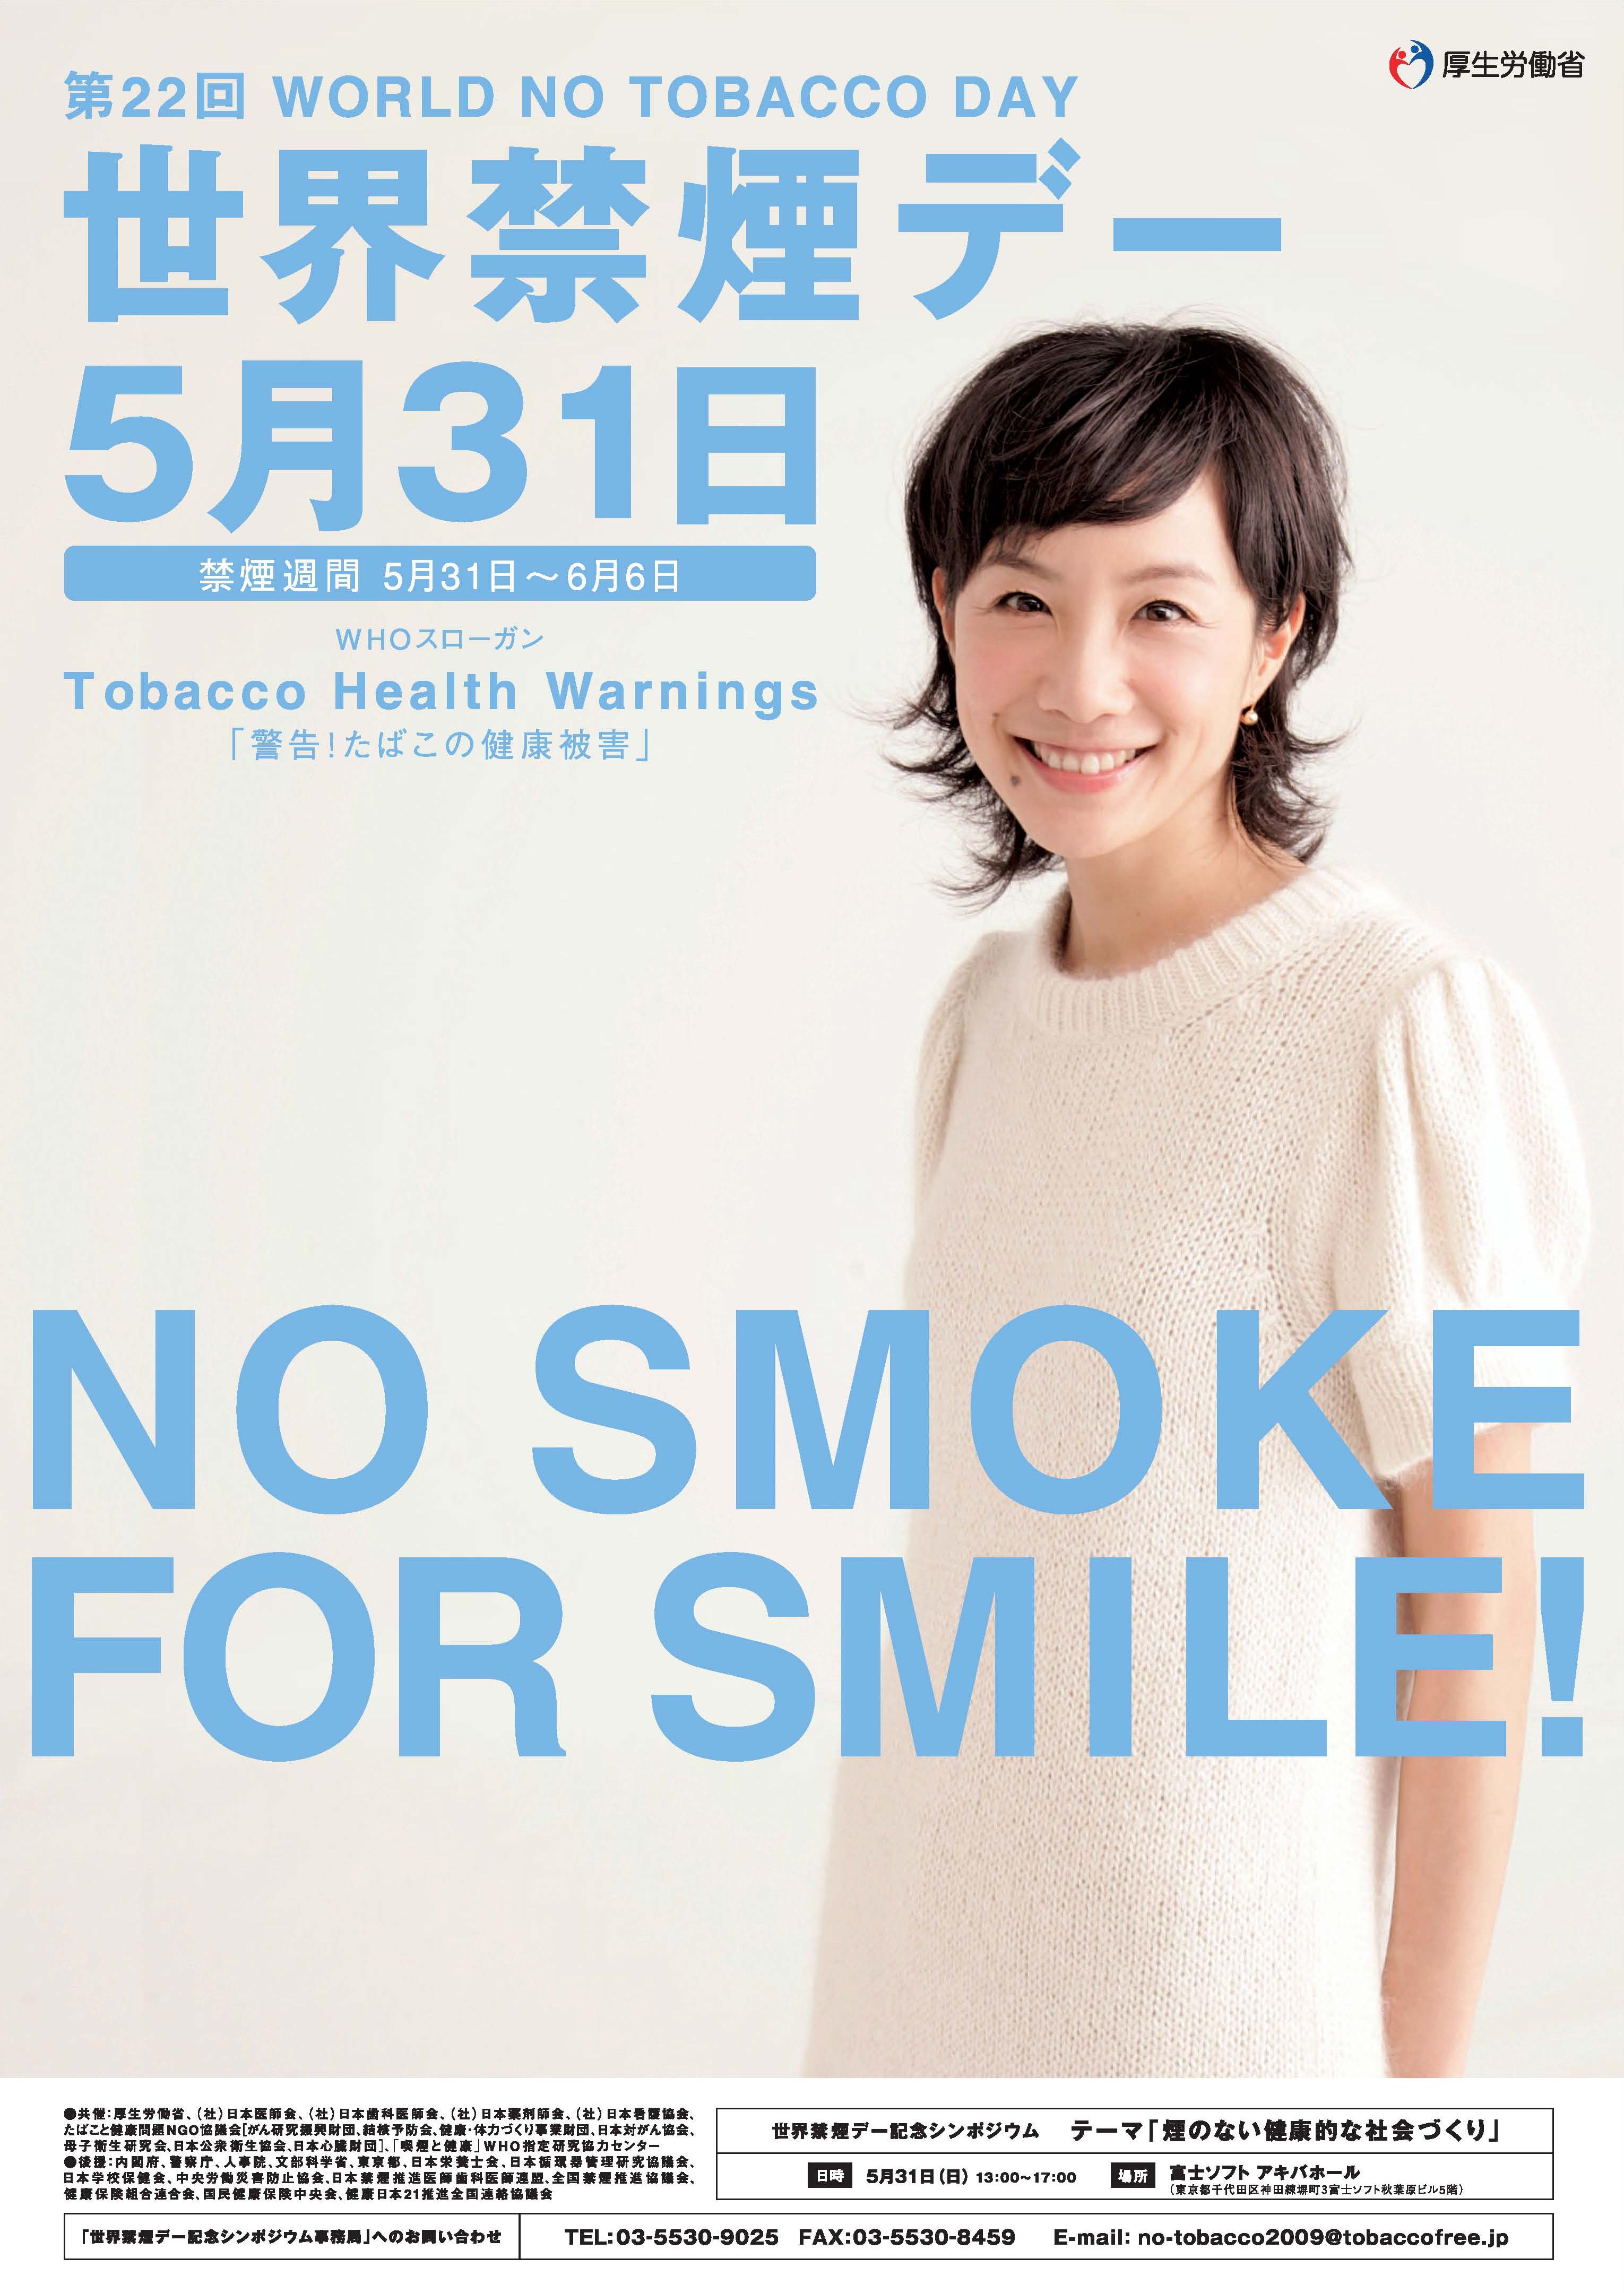 http://www.jatahq.org/tobacco_ngo/poster/2009mhlwposter.jpg